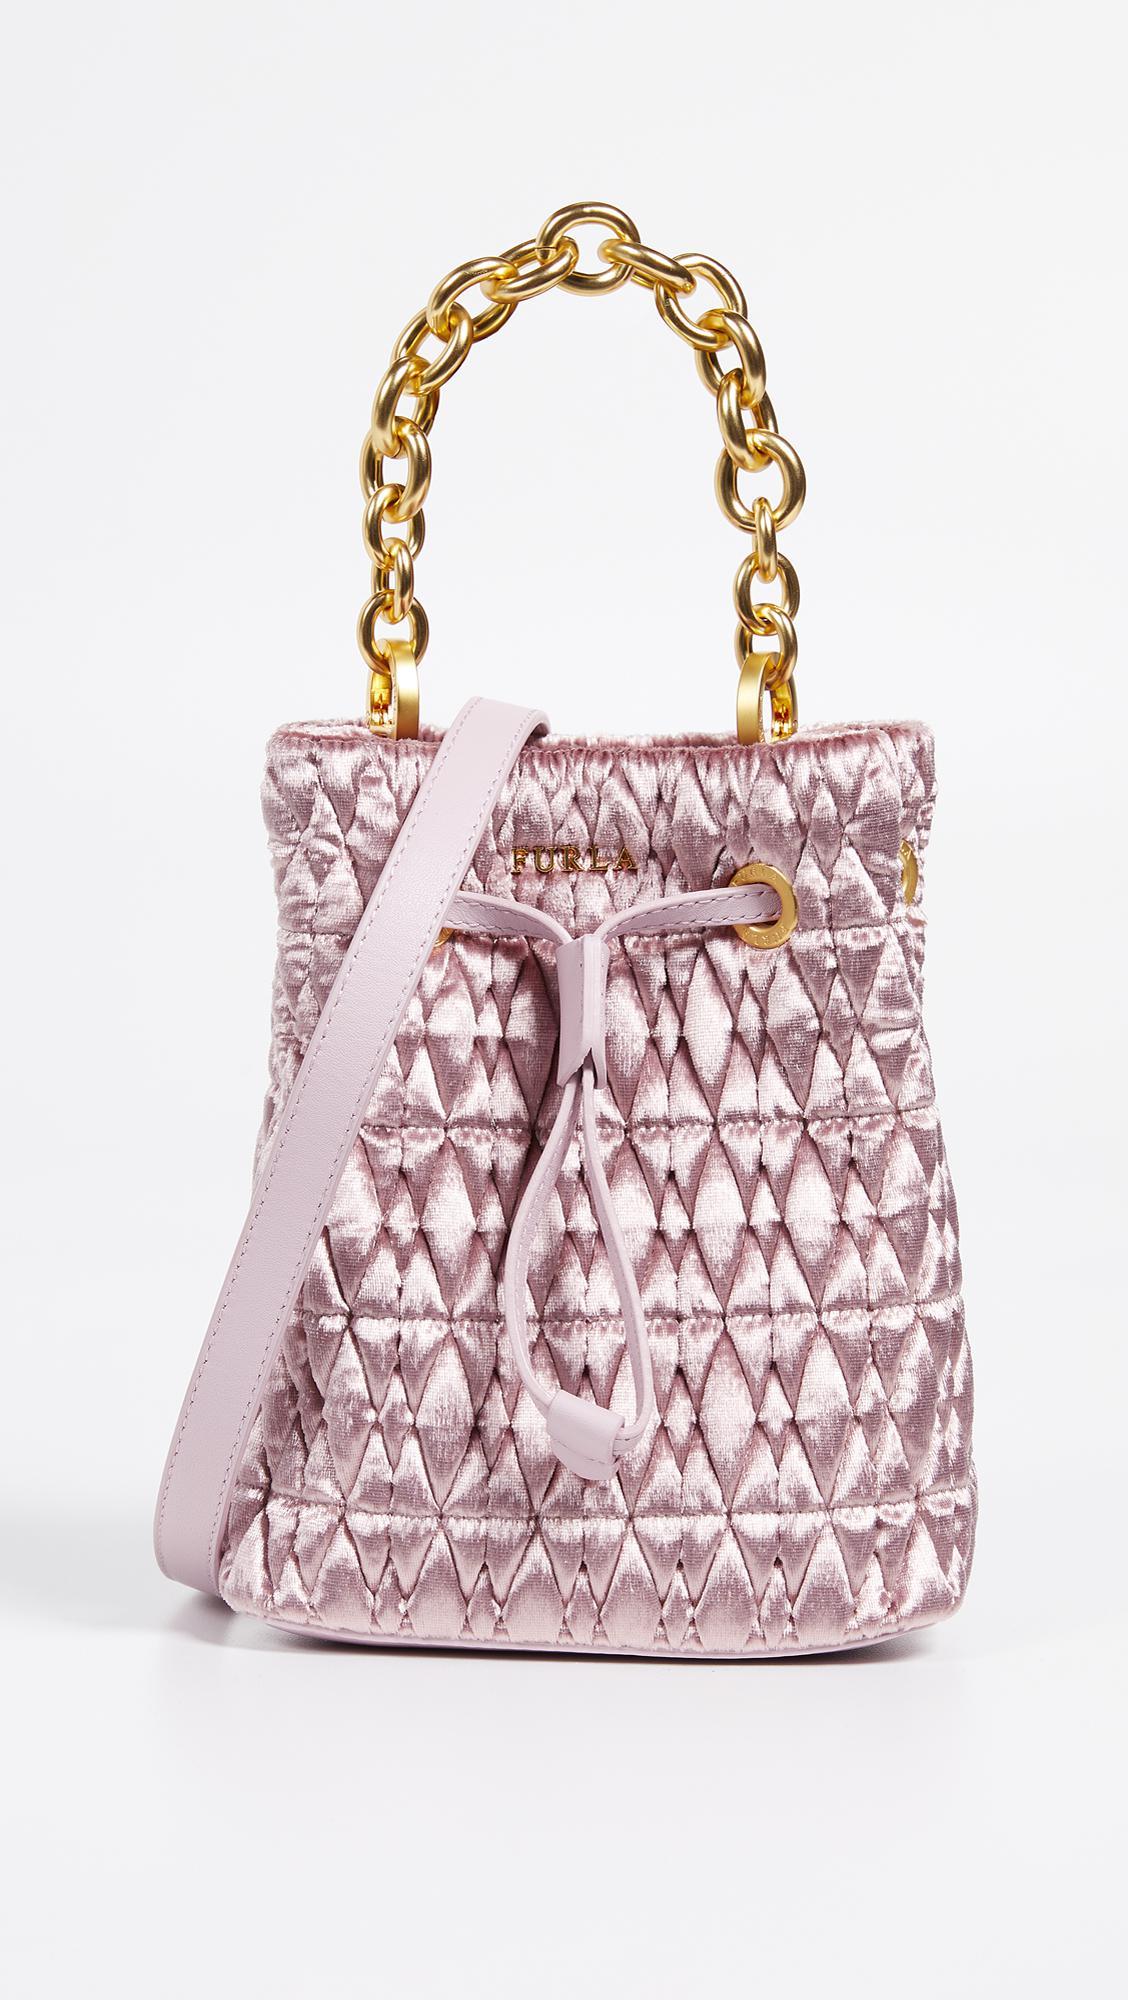 a922e547c613 Furla. Women s Stacy Cometa Mini Drawstring Bag